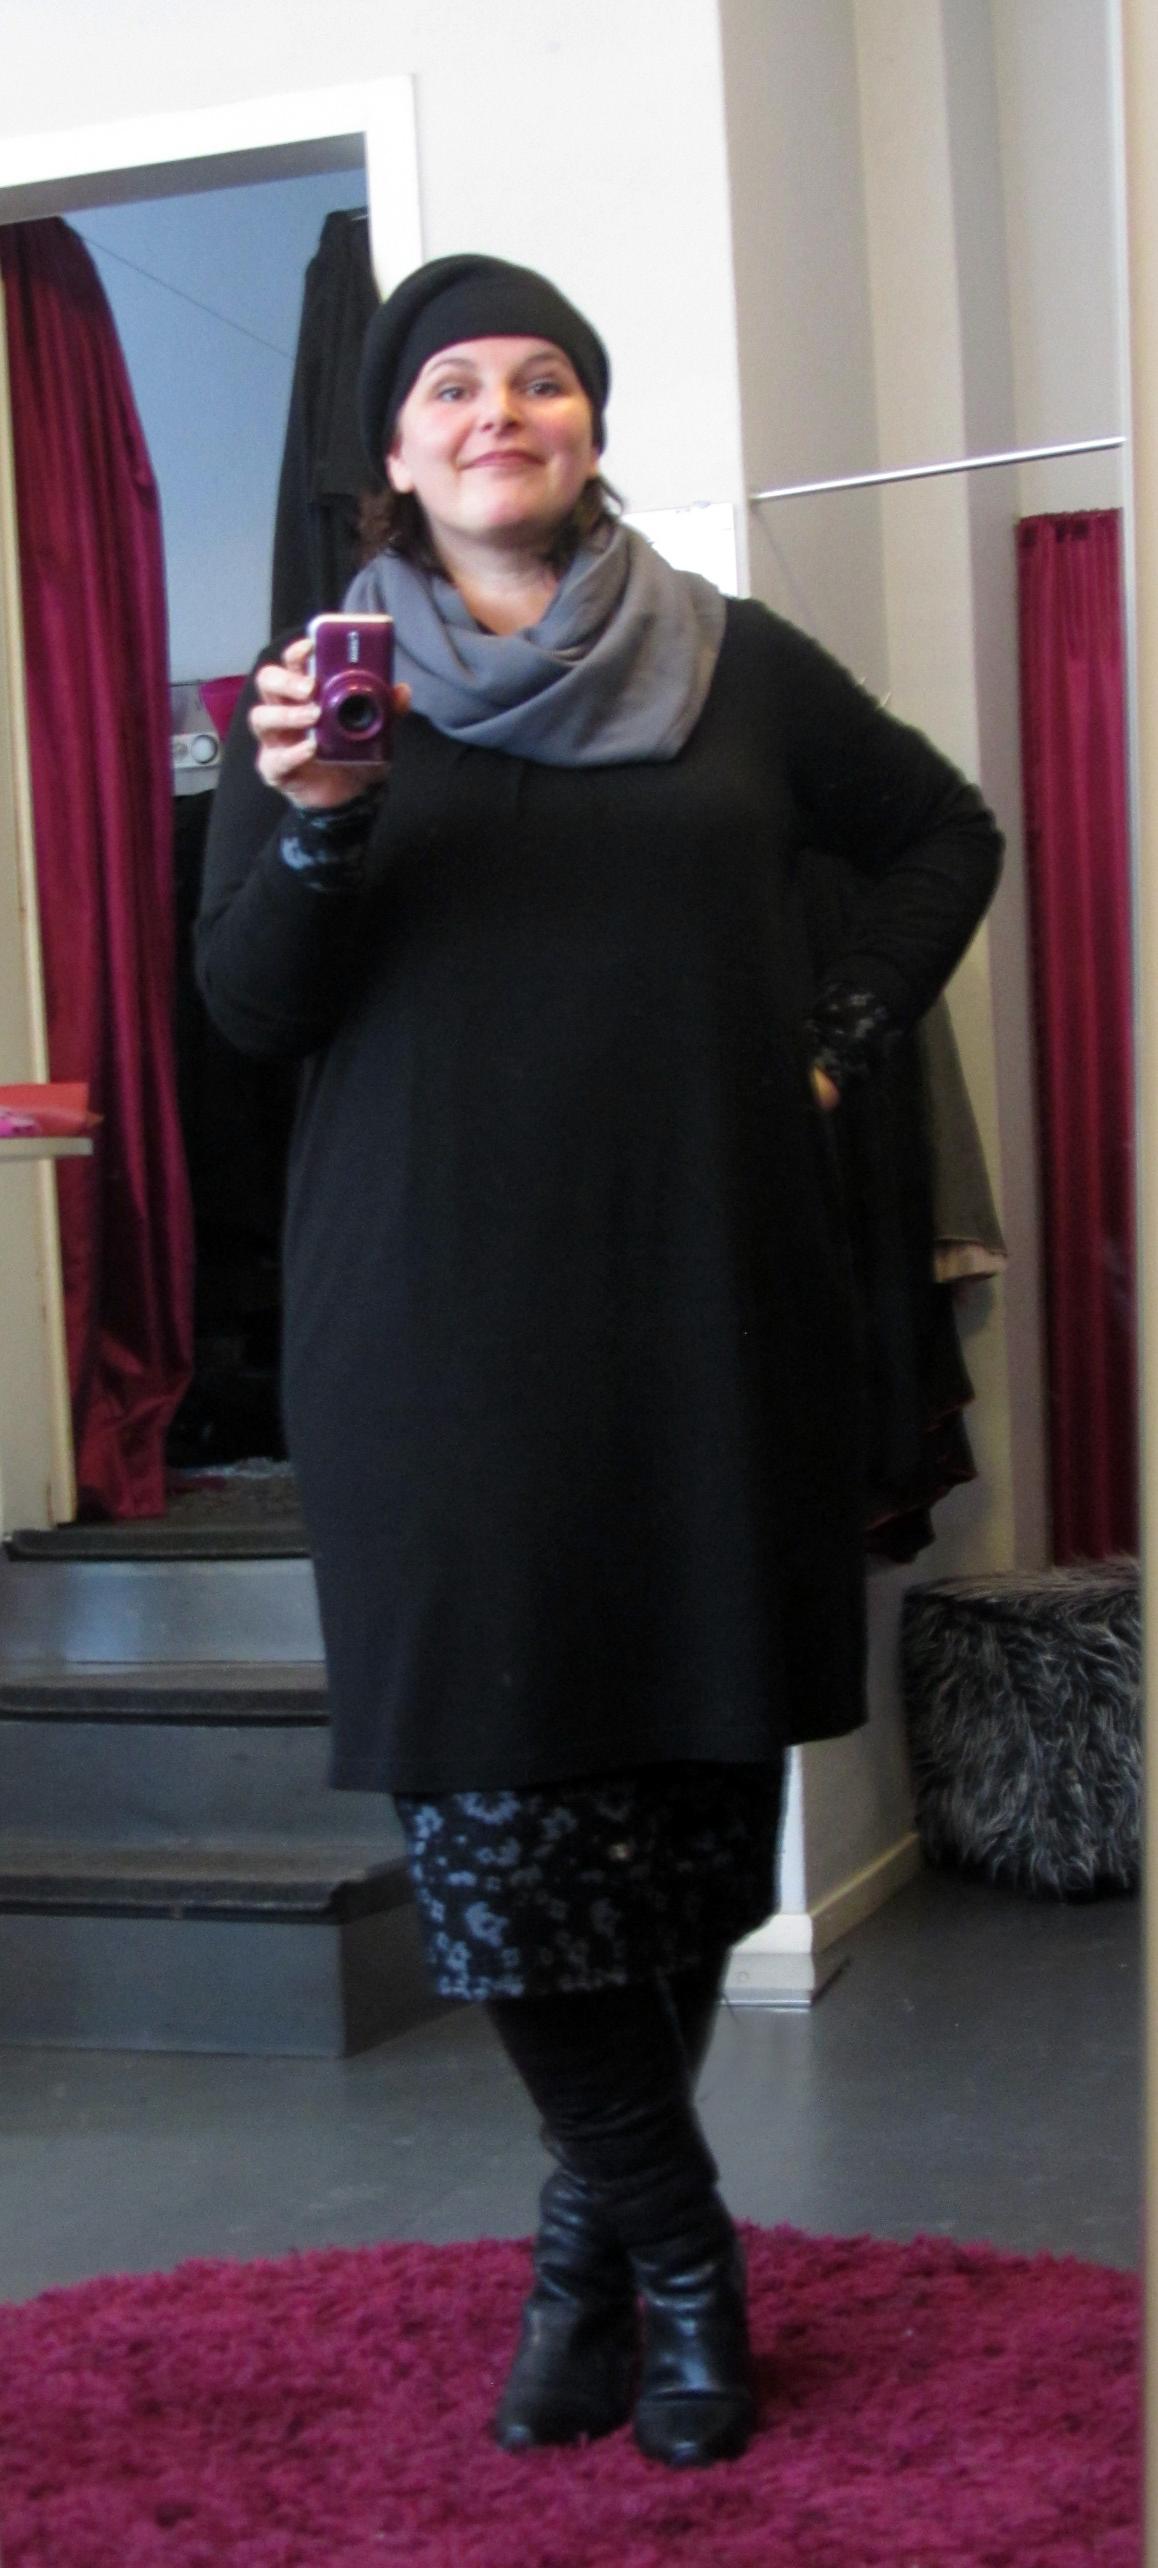 plus size outfit no 12 think stiefel selbstgen hter rock mit stulpen strickkleid xxl mode. Black Bedroom Furniture Sets. Home Design Ideas